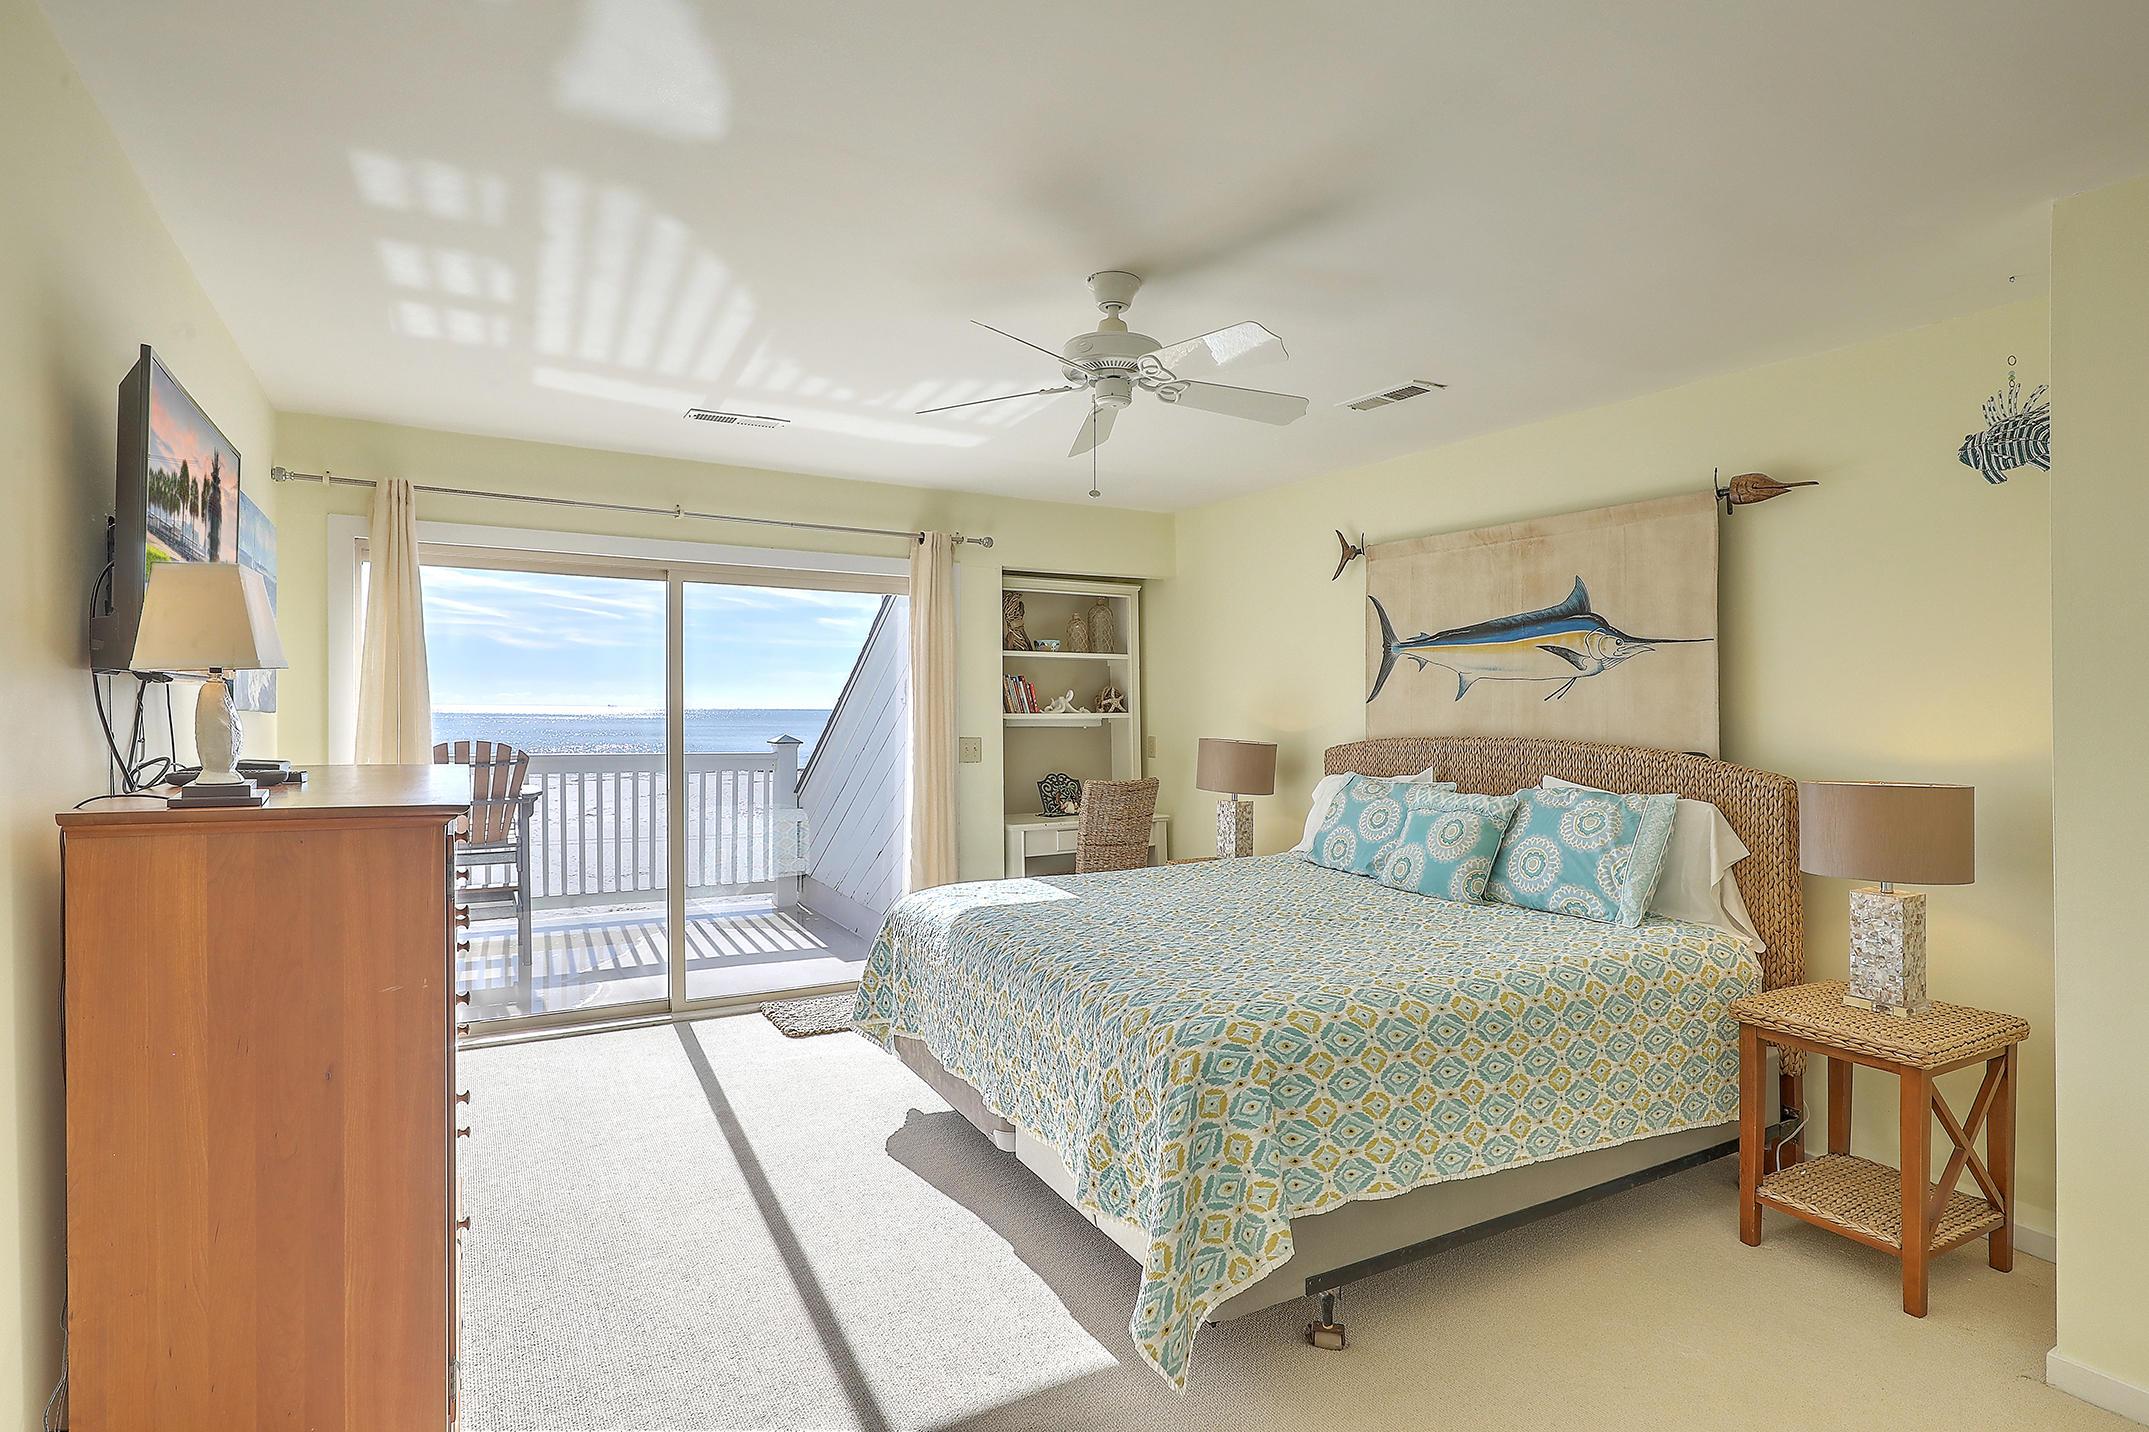 Wild Dunes Homes For Sale - 14 Beachwood East, Isle of Palms, SC - 28